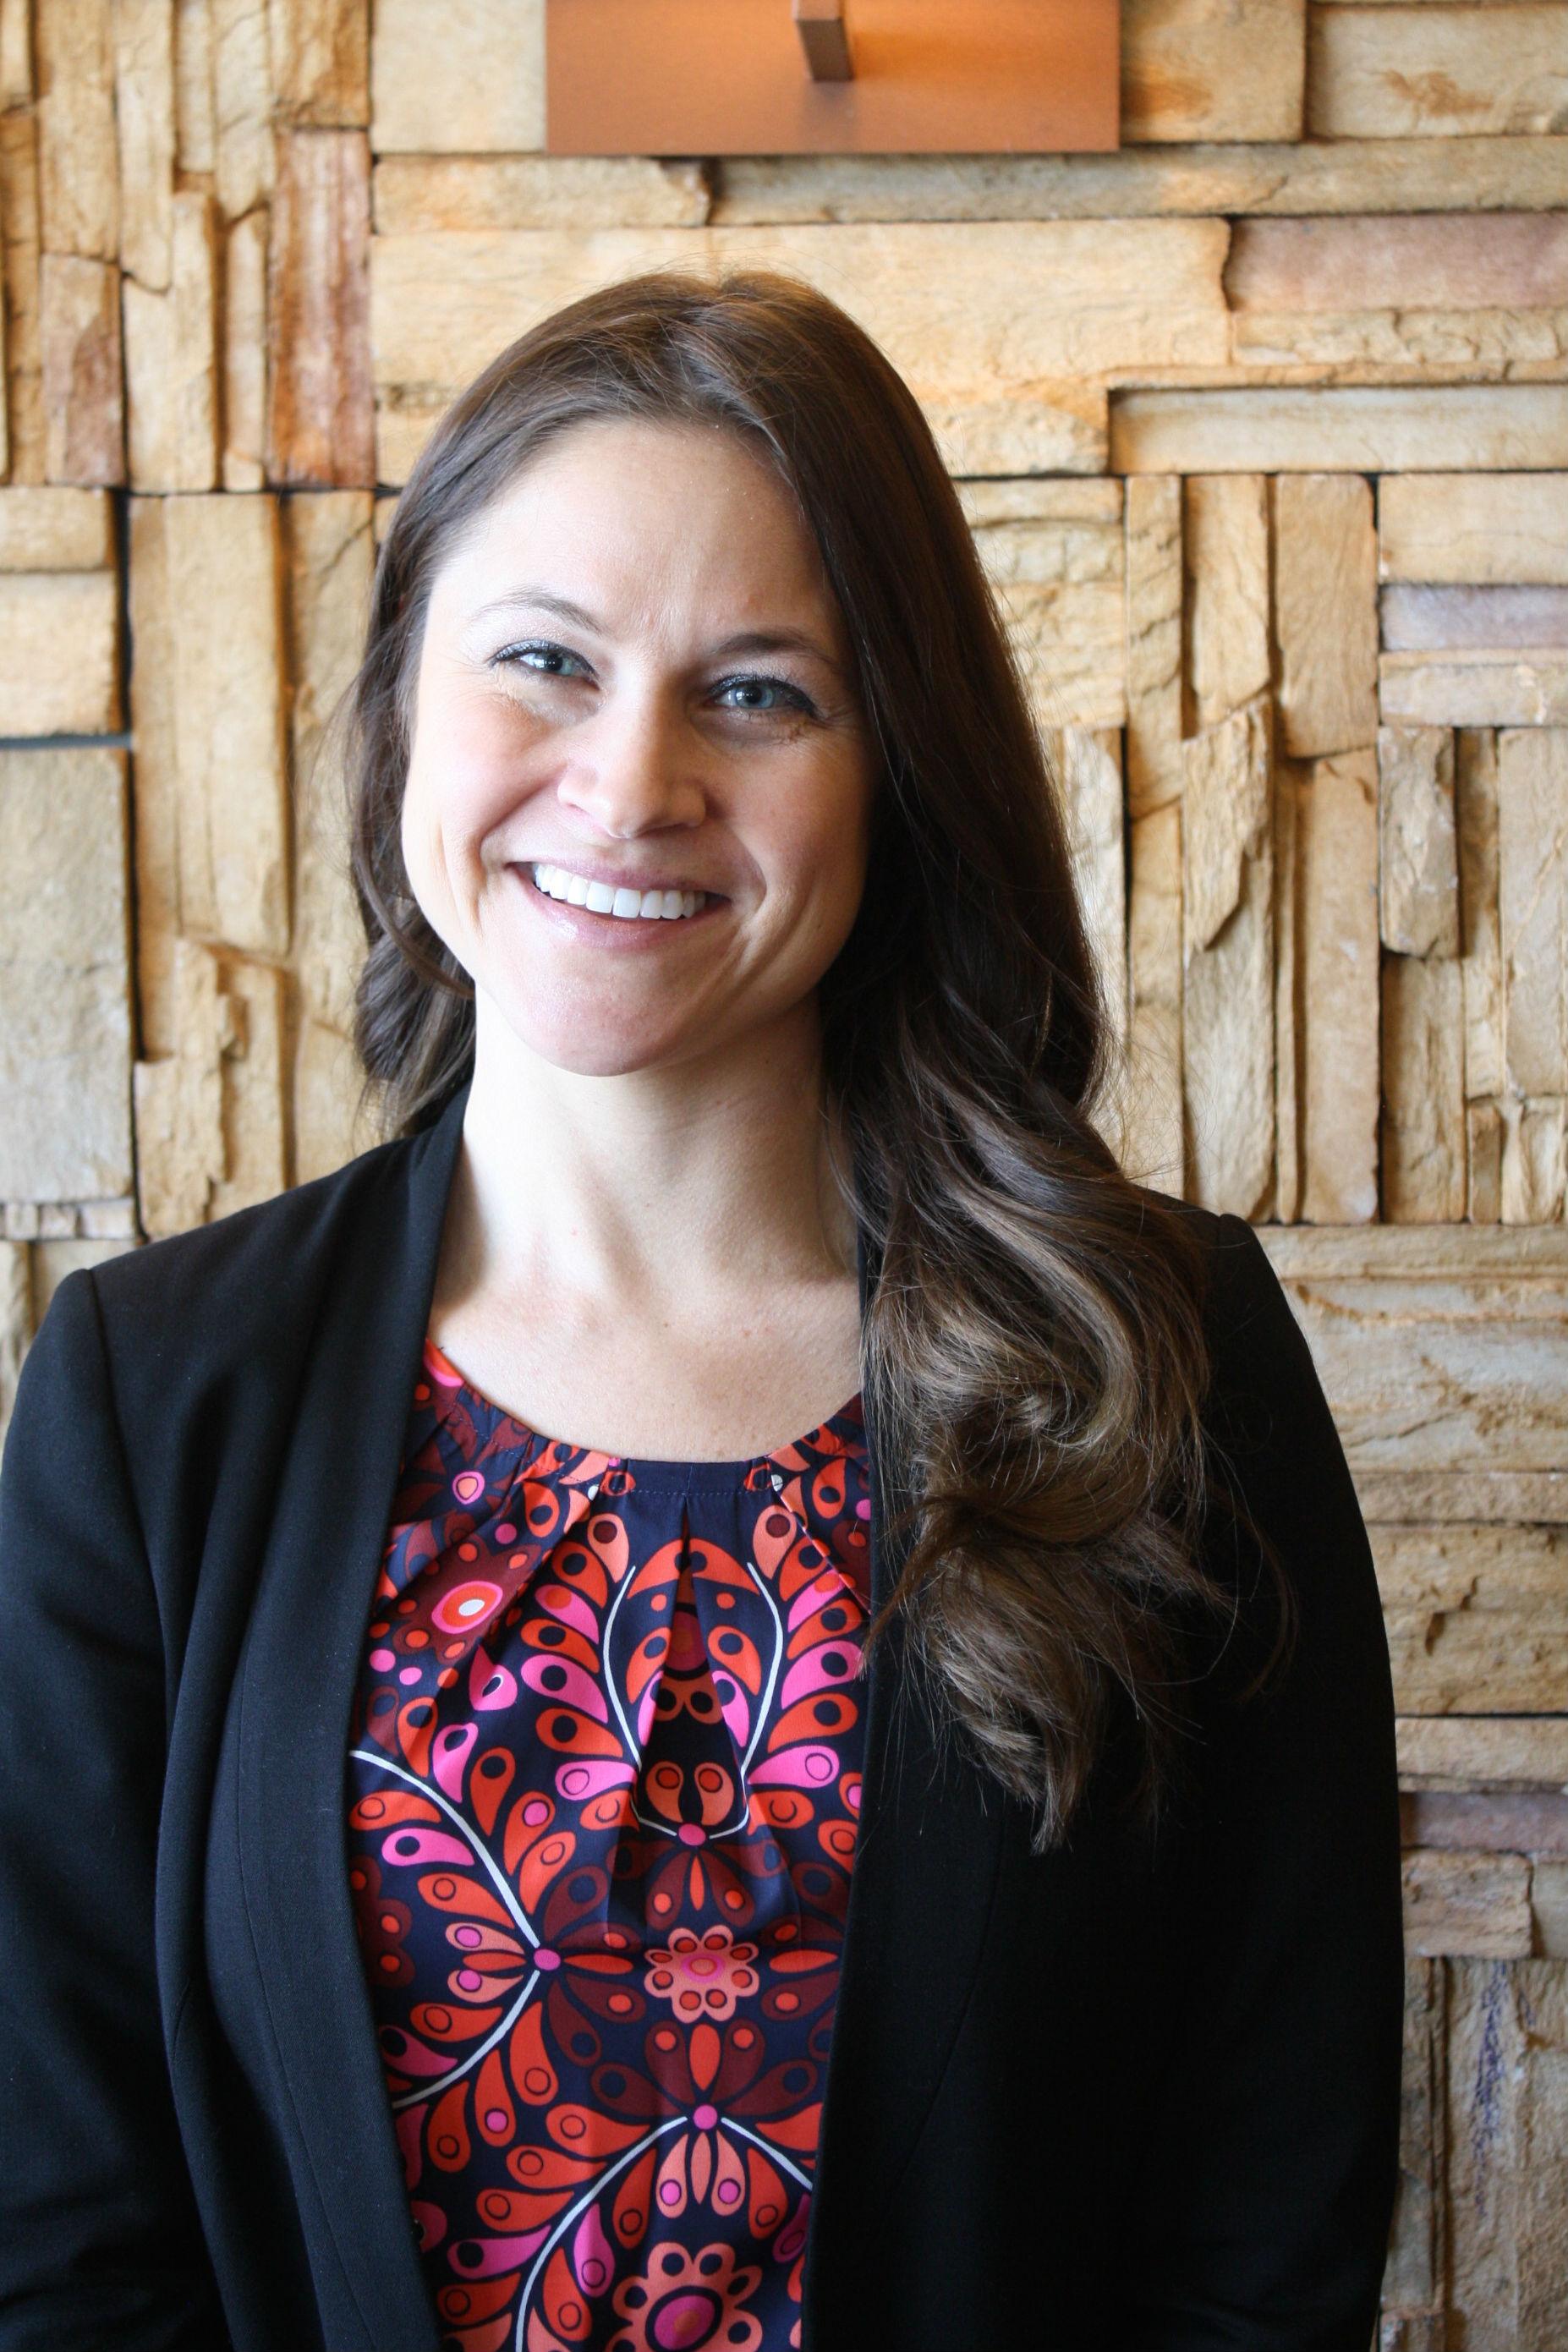 Northwest Indiana Life in the Spotlight: Lisa Carpenter